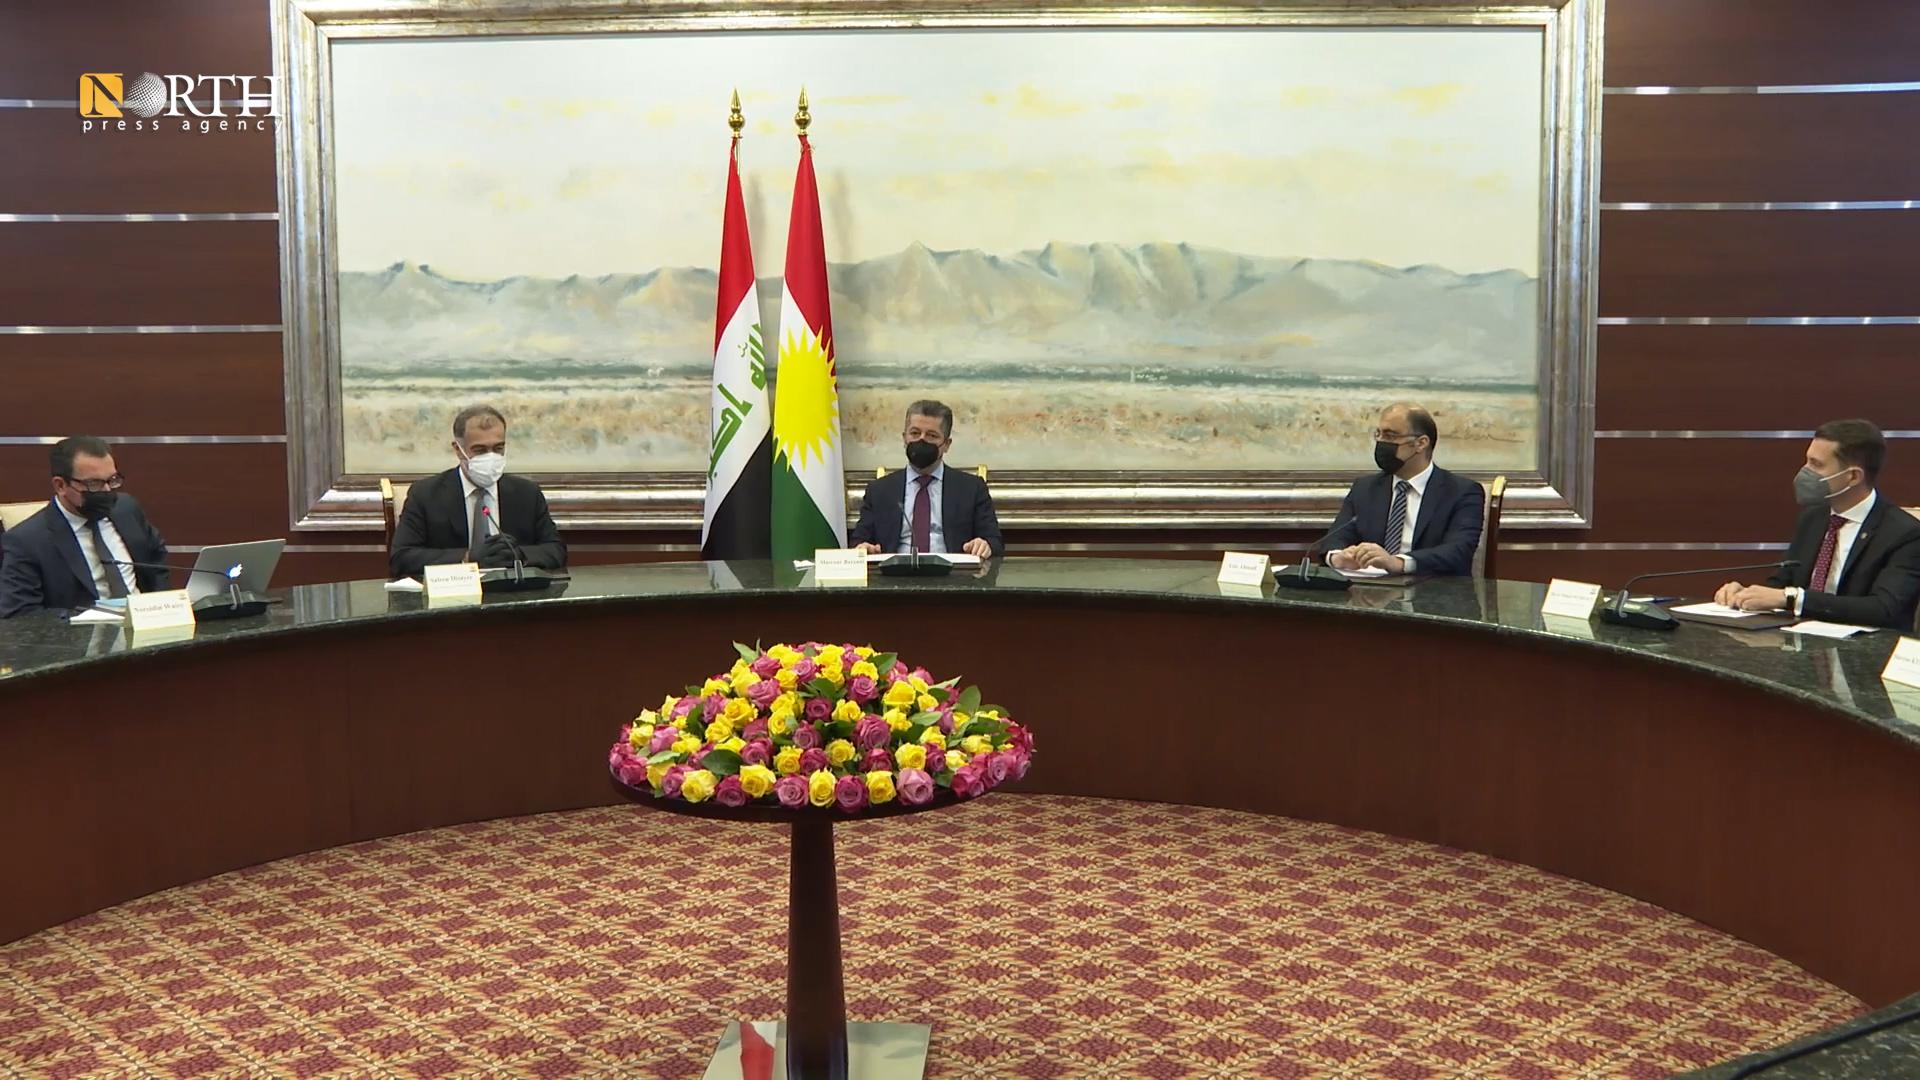 Photo of KRG Prime Minister meets EU consuls and representatives in Erbil